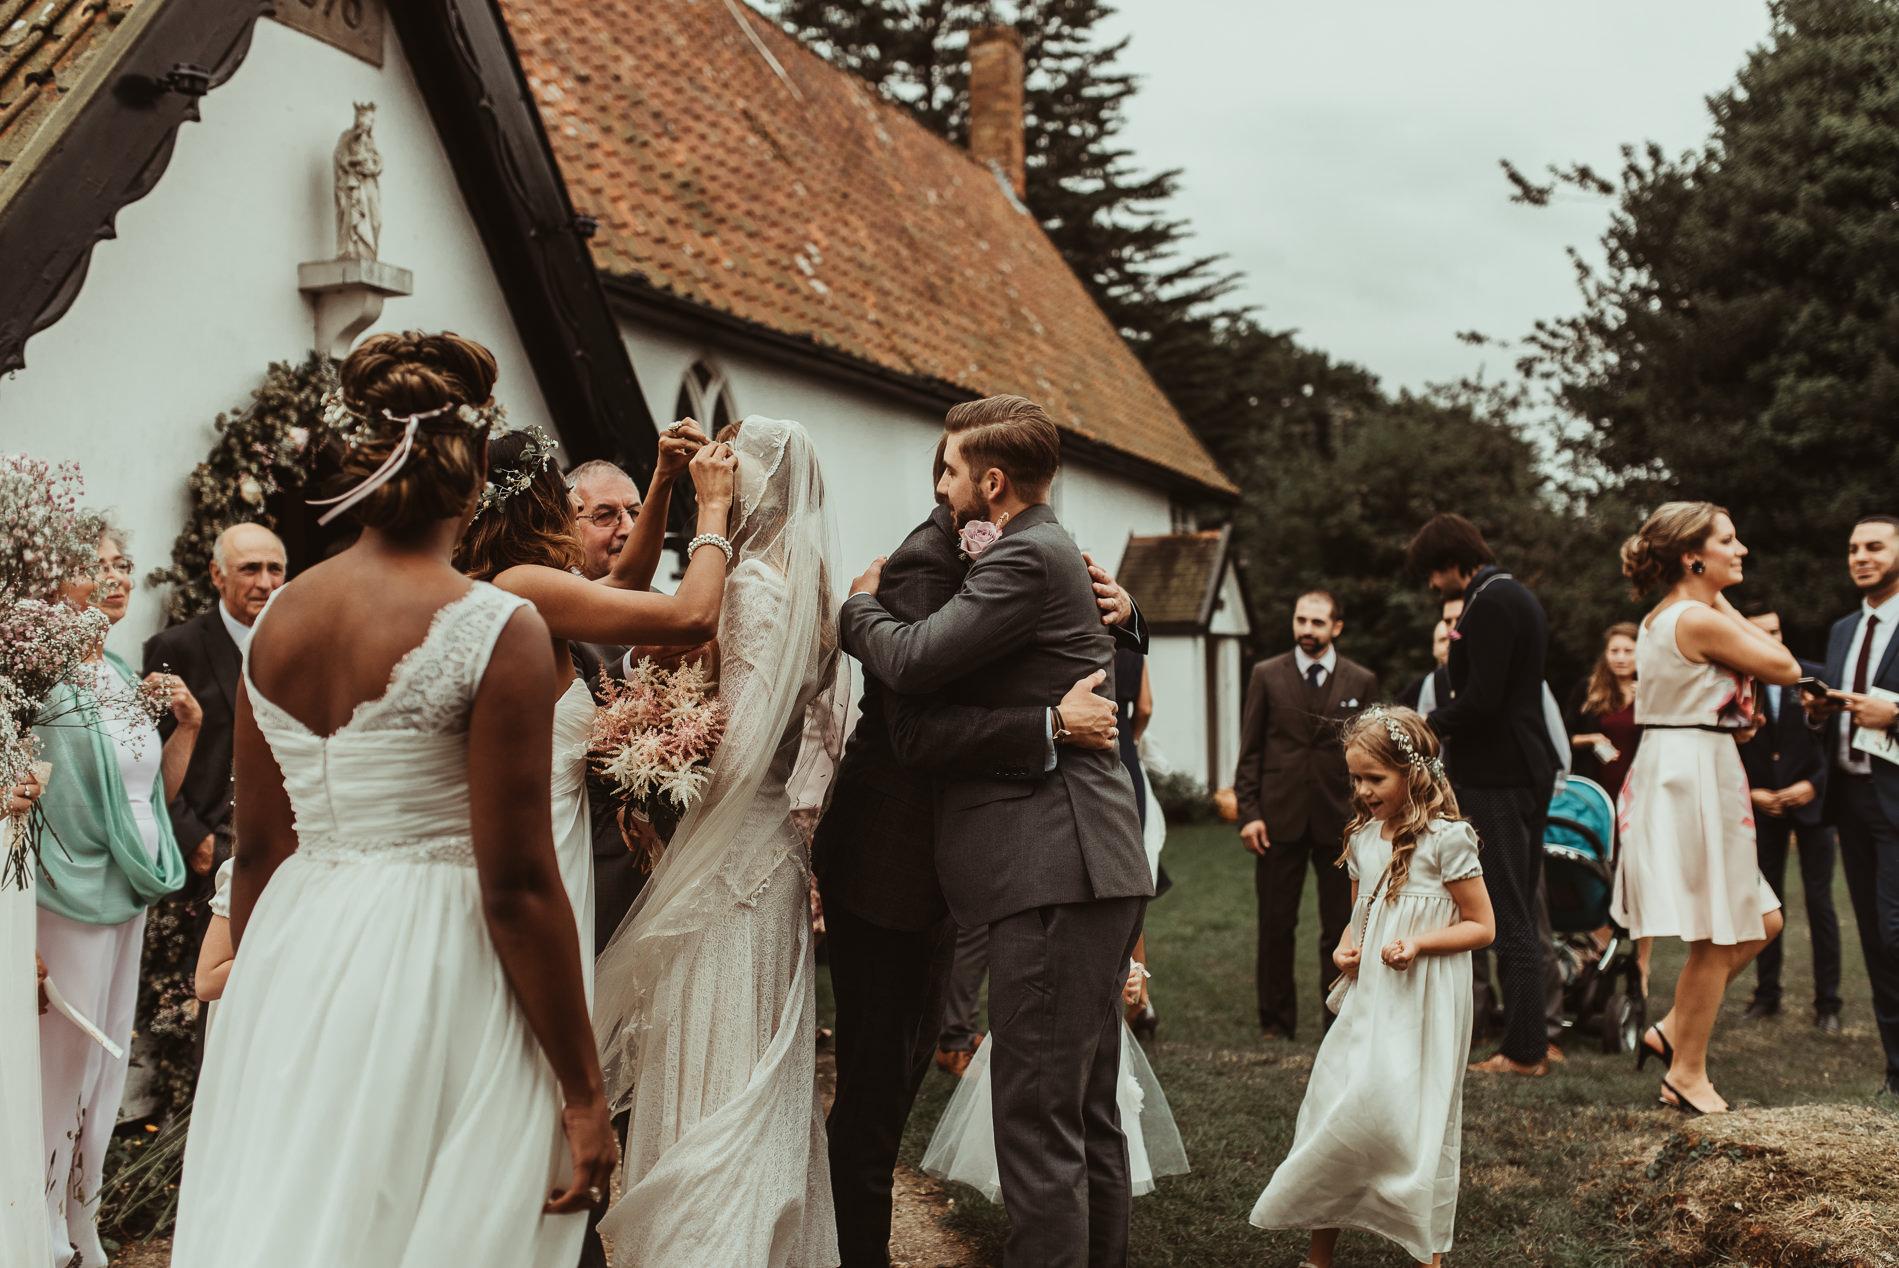 bohemian_wedding_lawshall_church_garden42